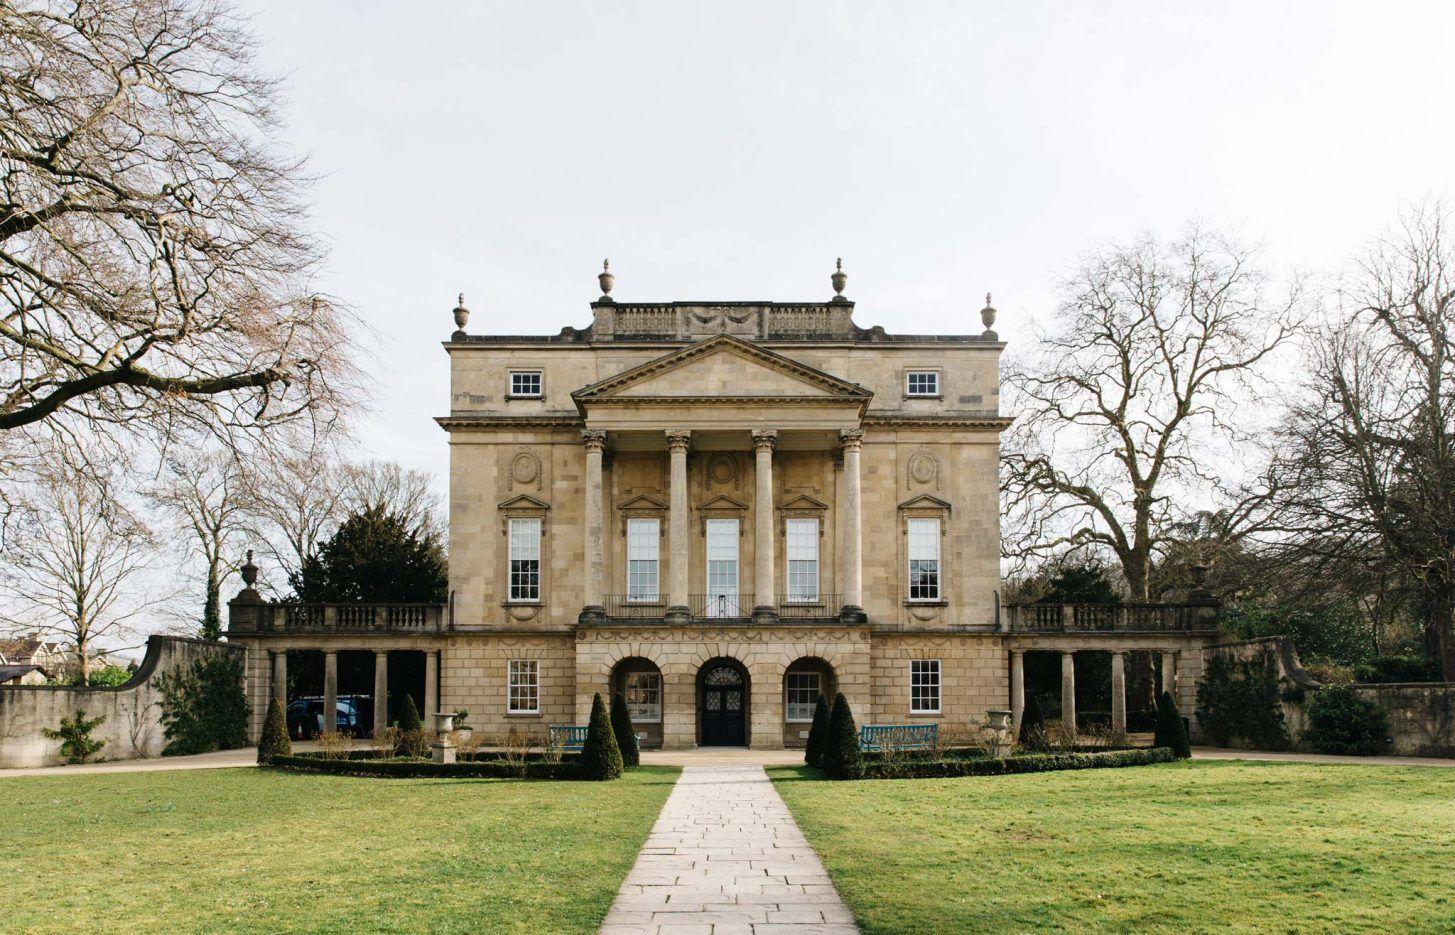 Jane Austen's Bath: The Holburne Museum